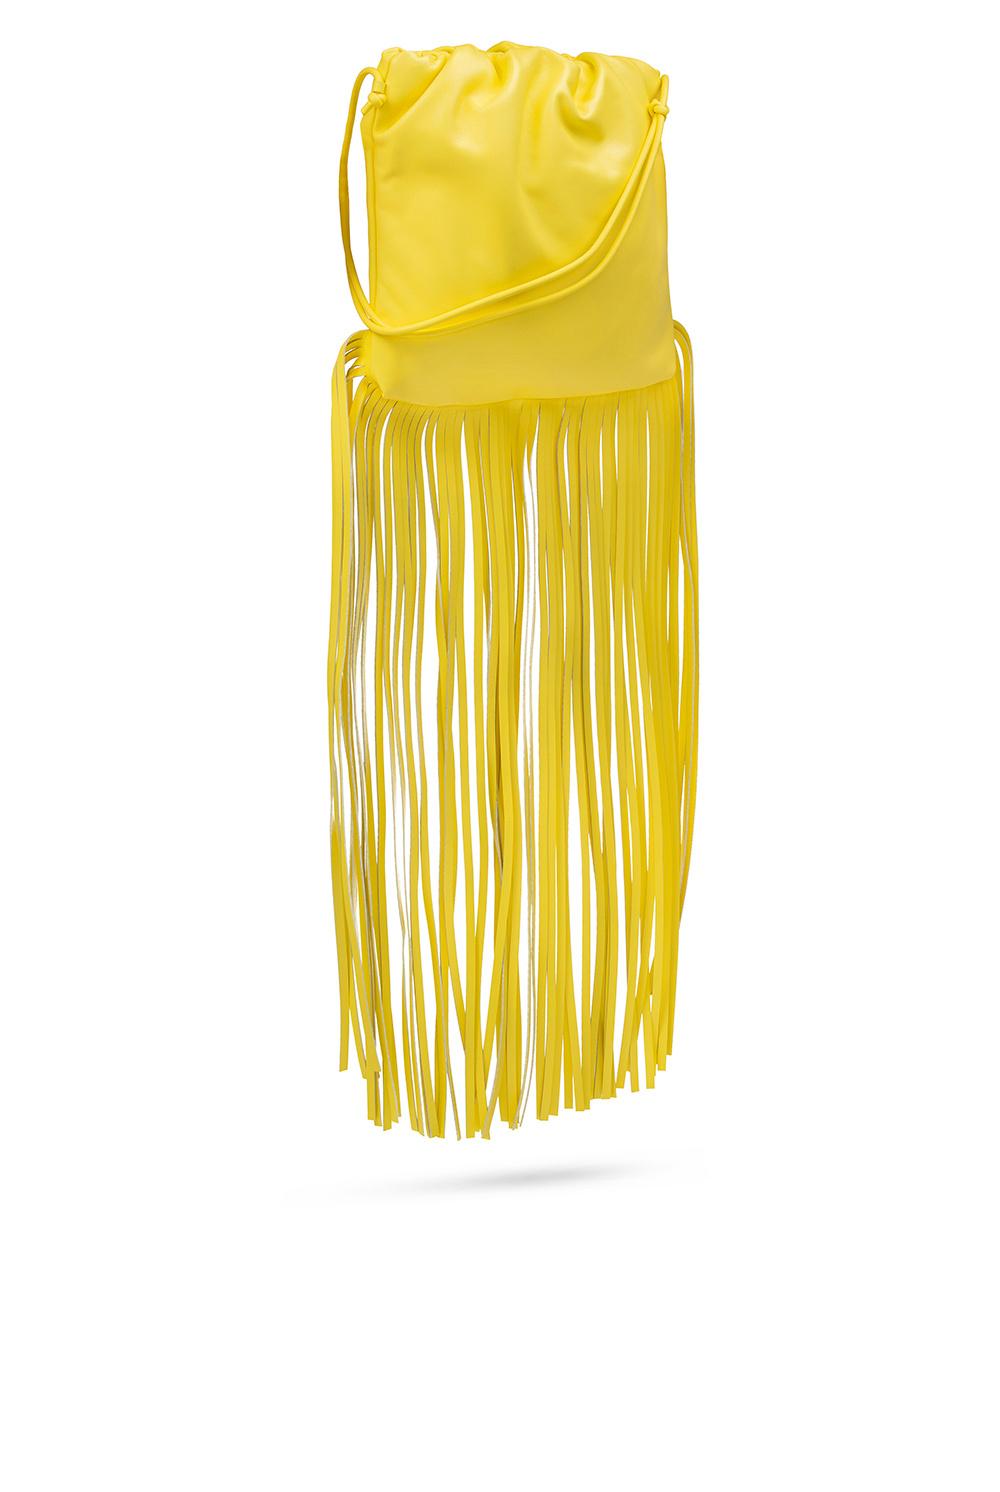 Bottega Veneta 'The Fringe Pouch' shoulder bag